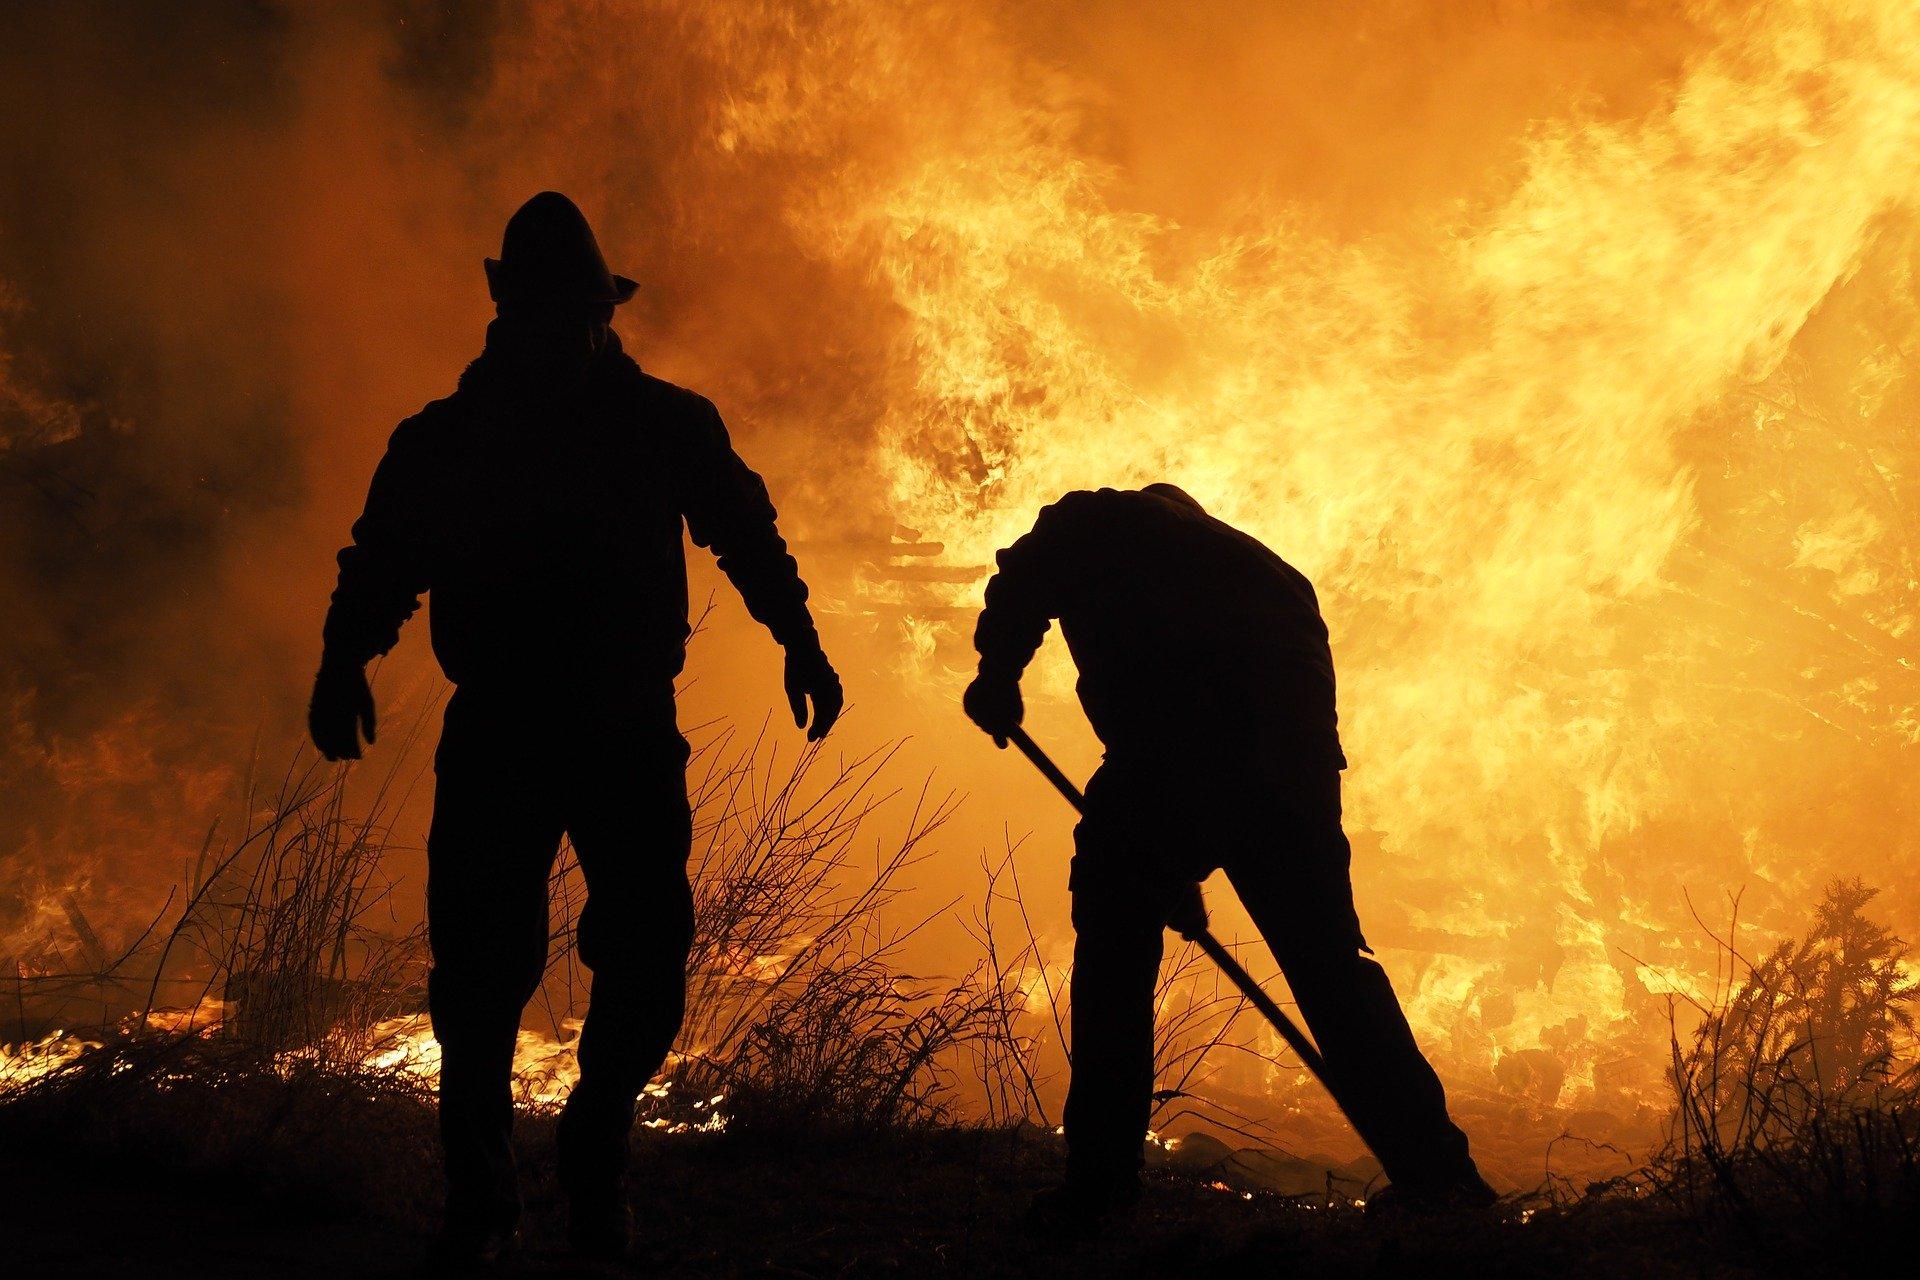 fire-extinguisher-3891361_1920